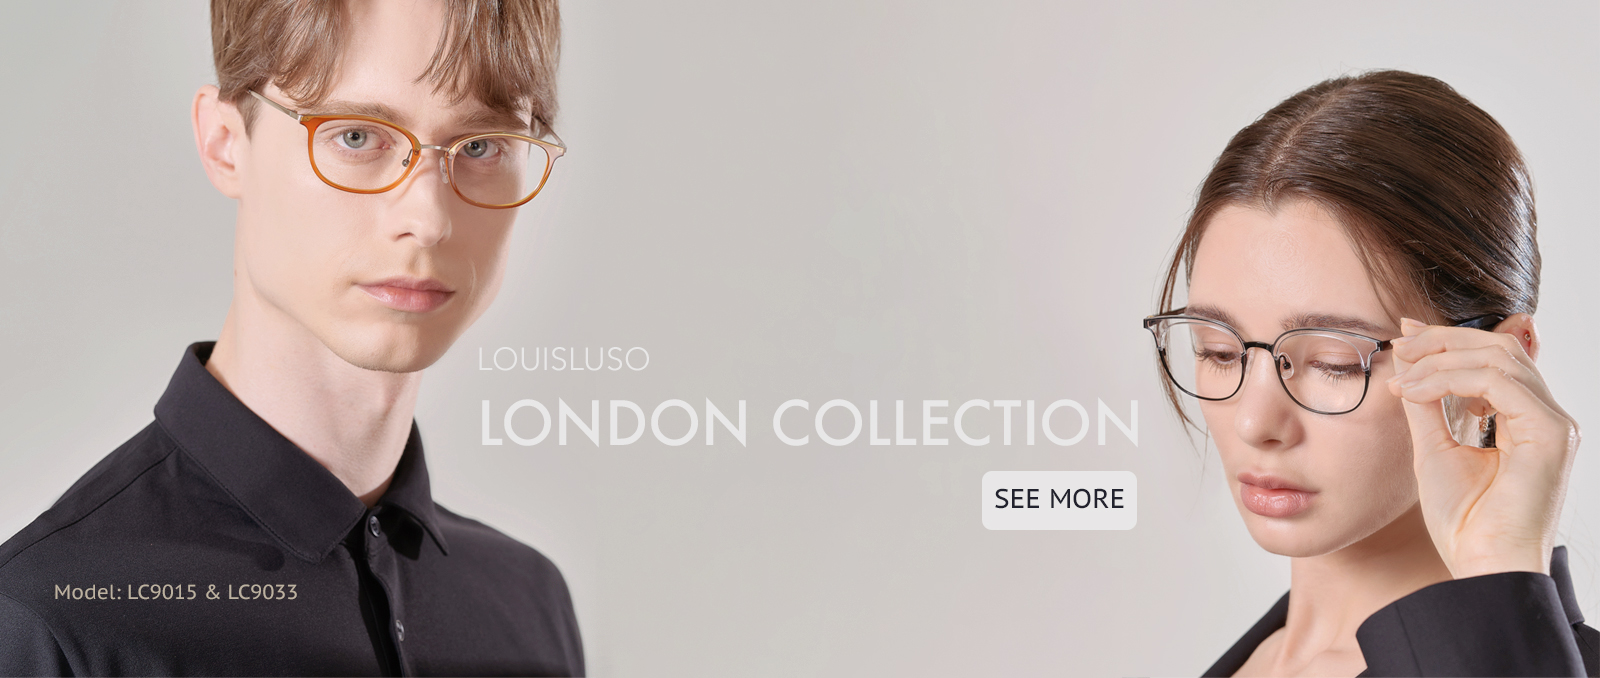 Louisluso_London_Collection_2